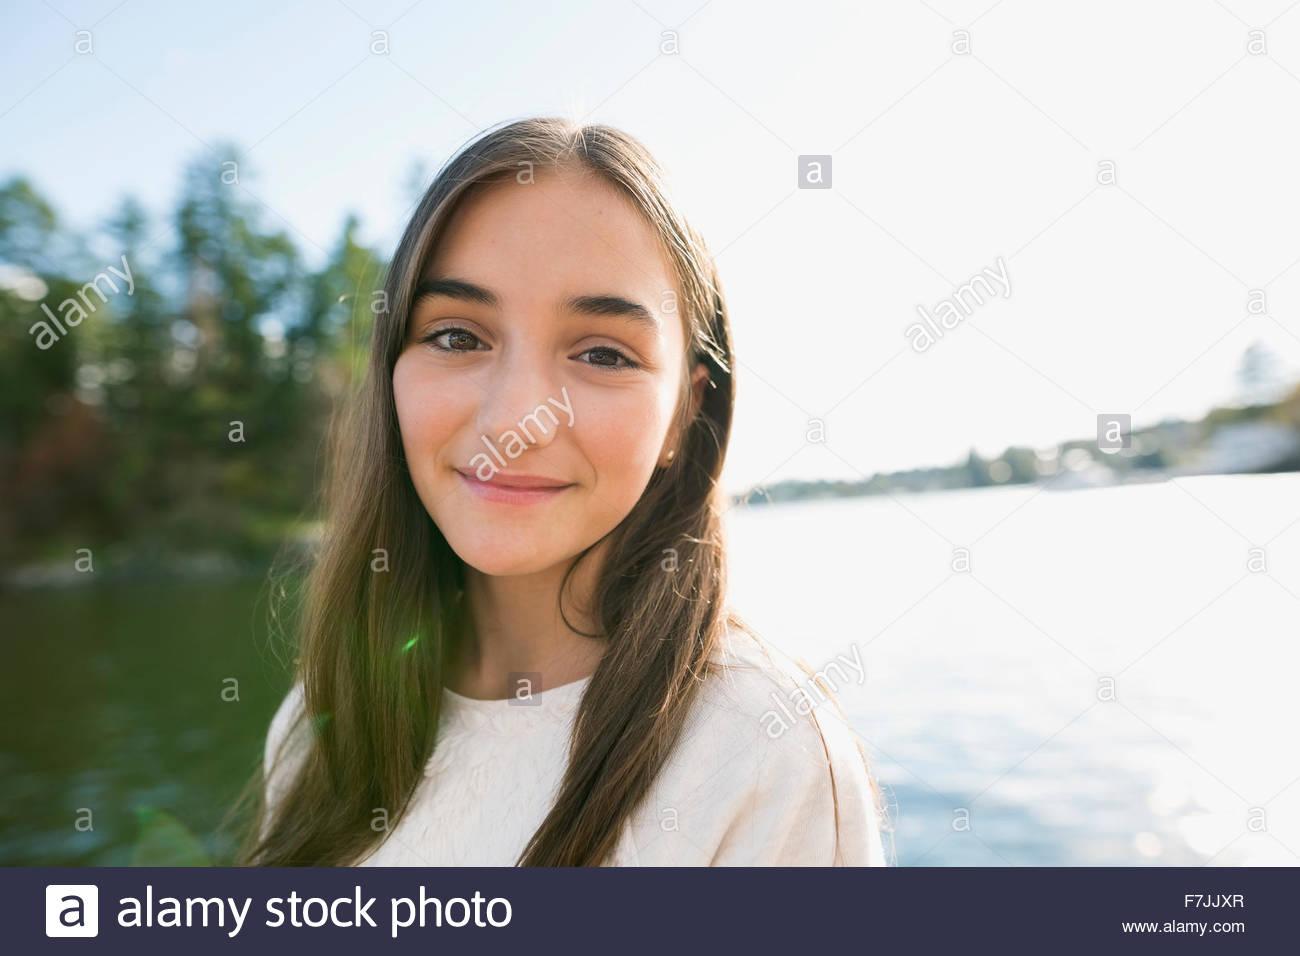 Porträt lächelnde Brünette Mädchen am See Stockbild